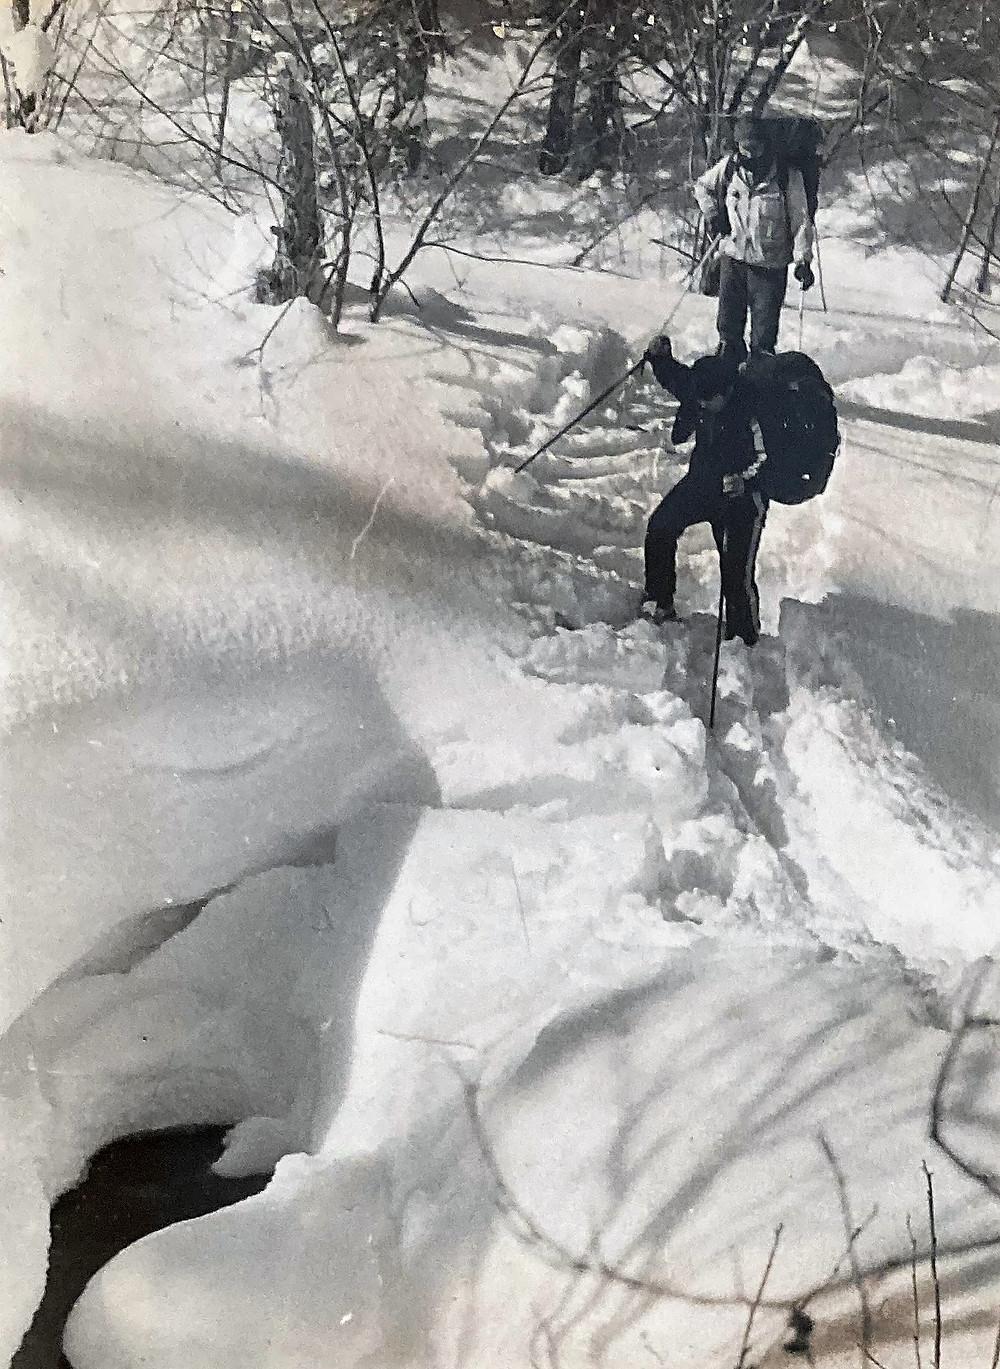 Река Лангари  skitour.club  Блог Сергея Чеботова